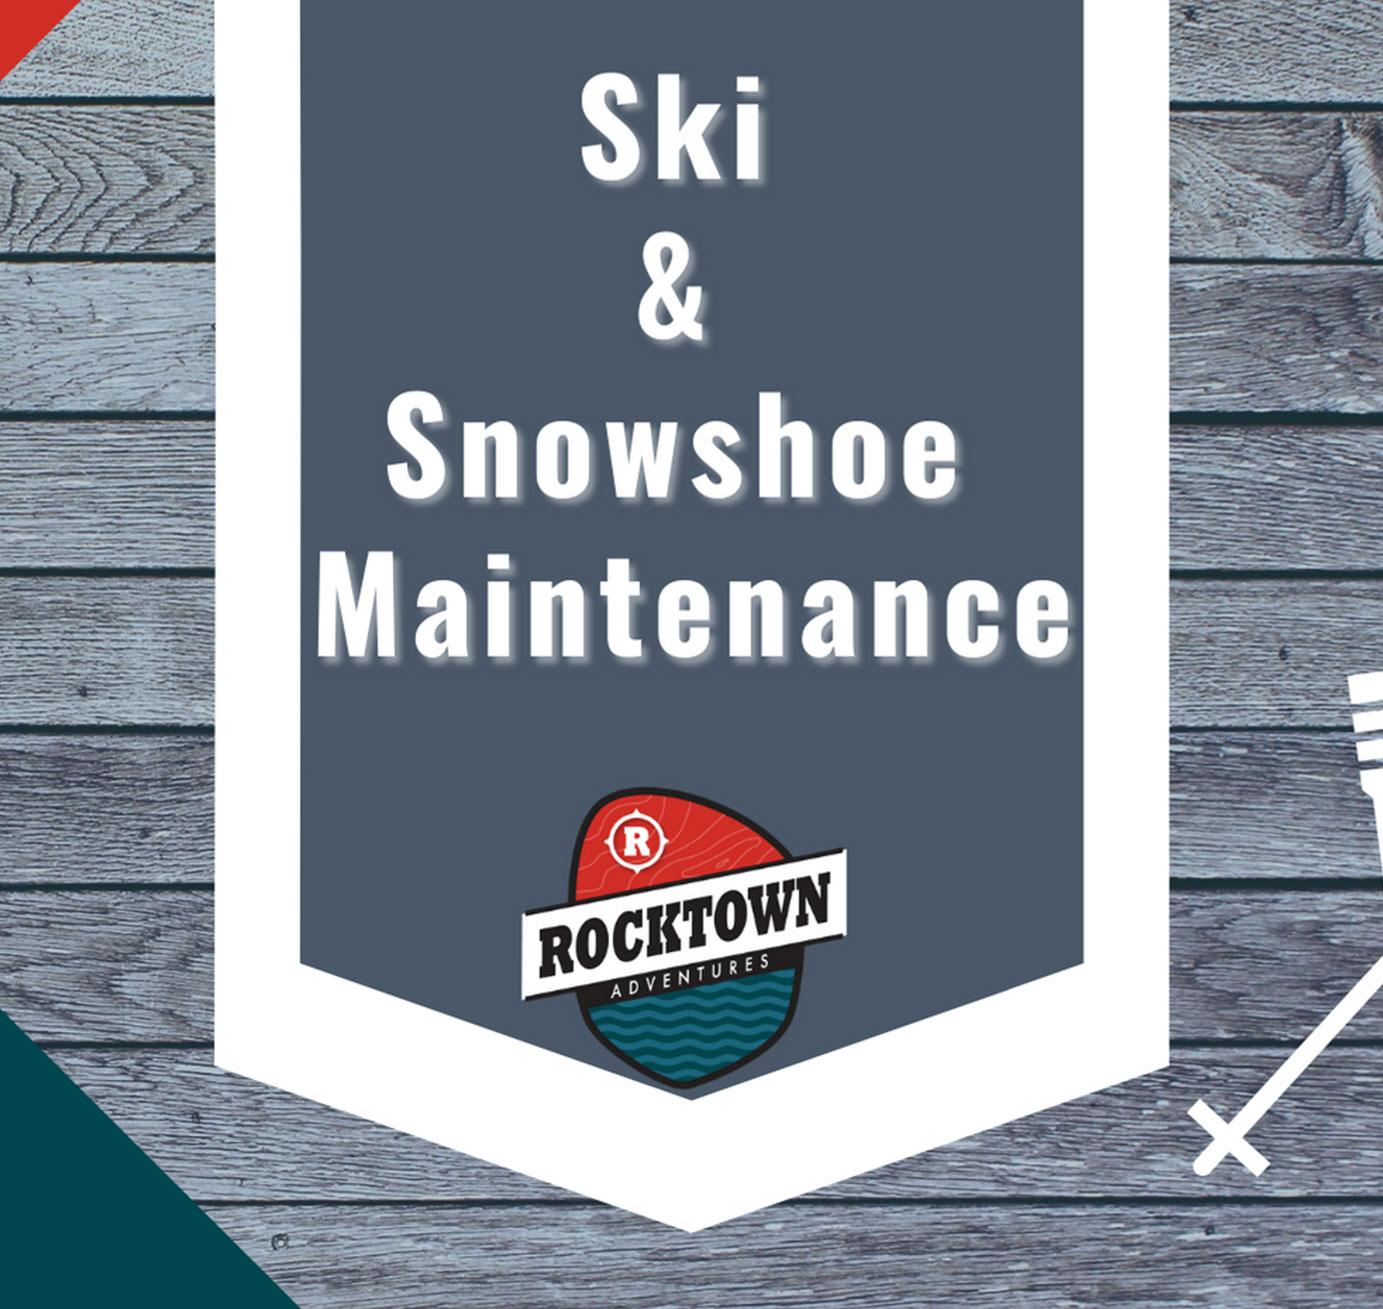 Rocktown Adventures | Ski and Snowshoe Maintenance